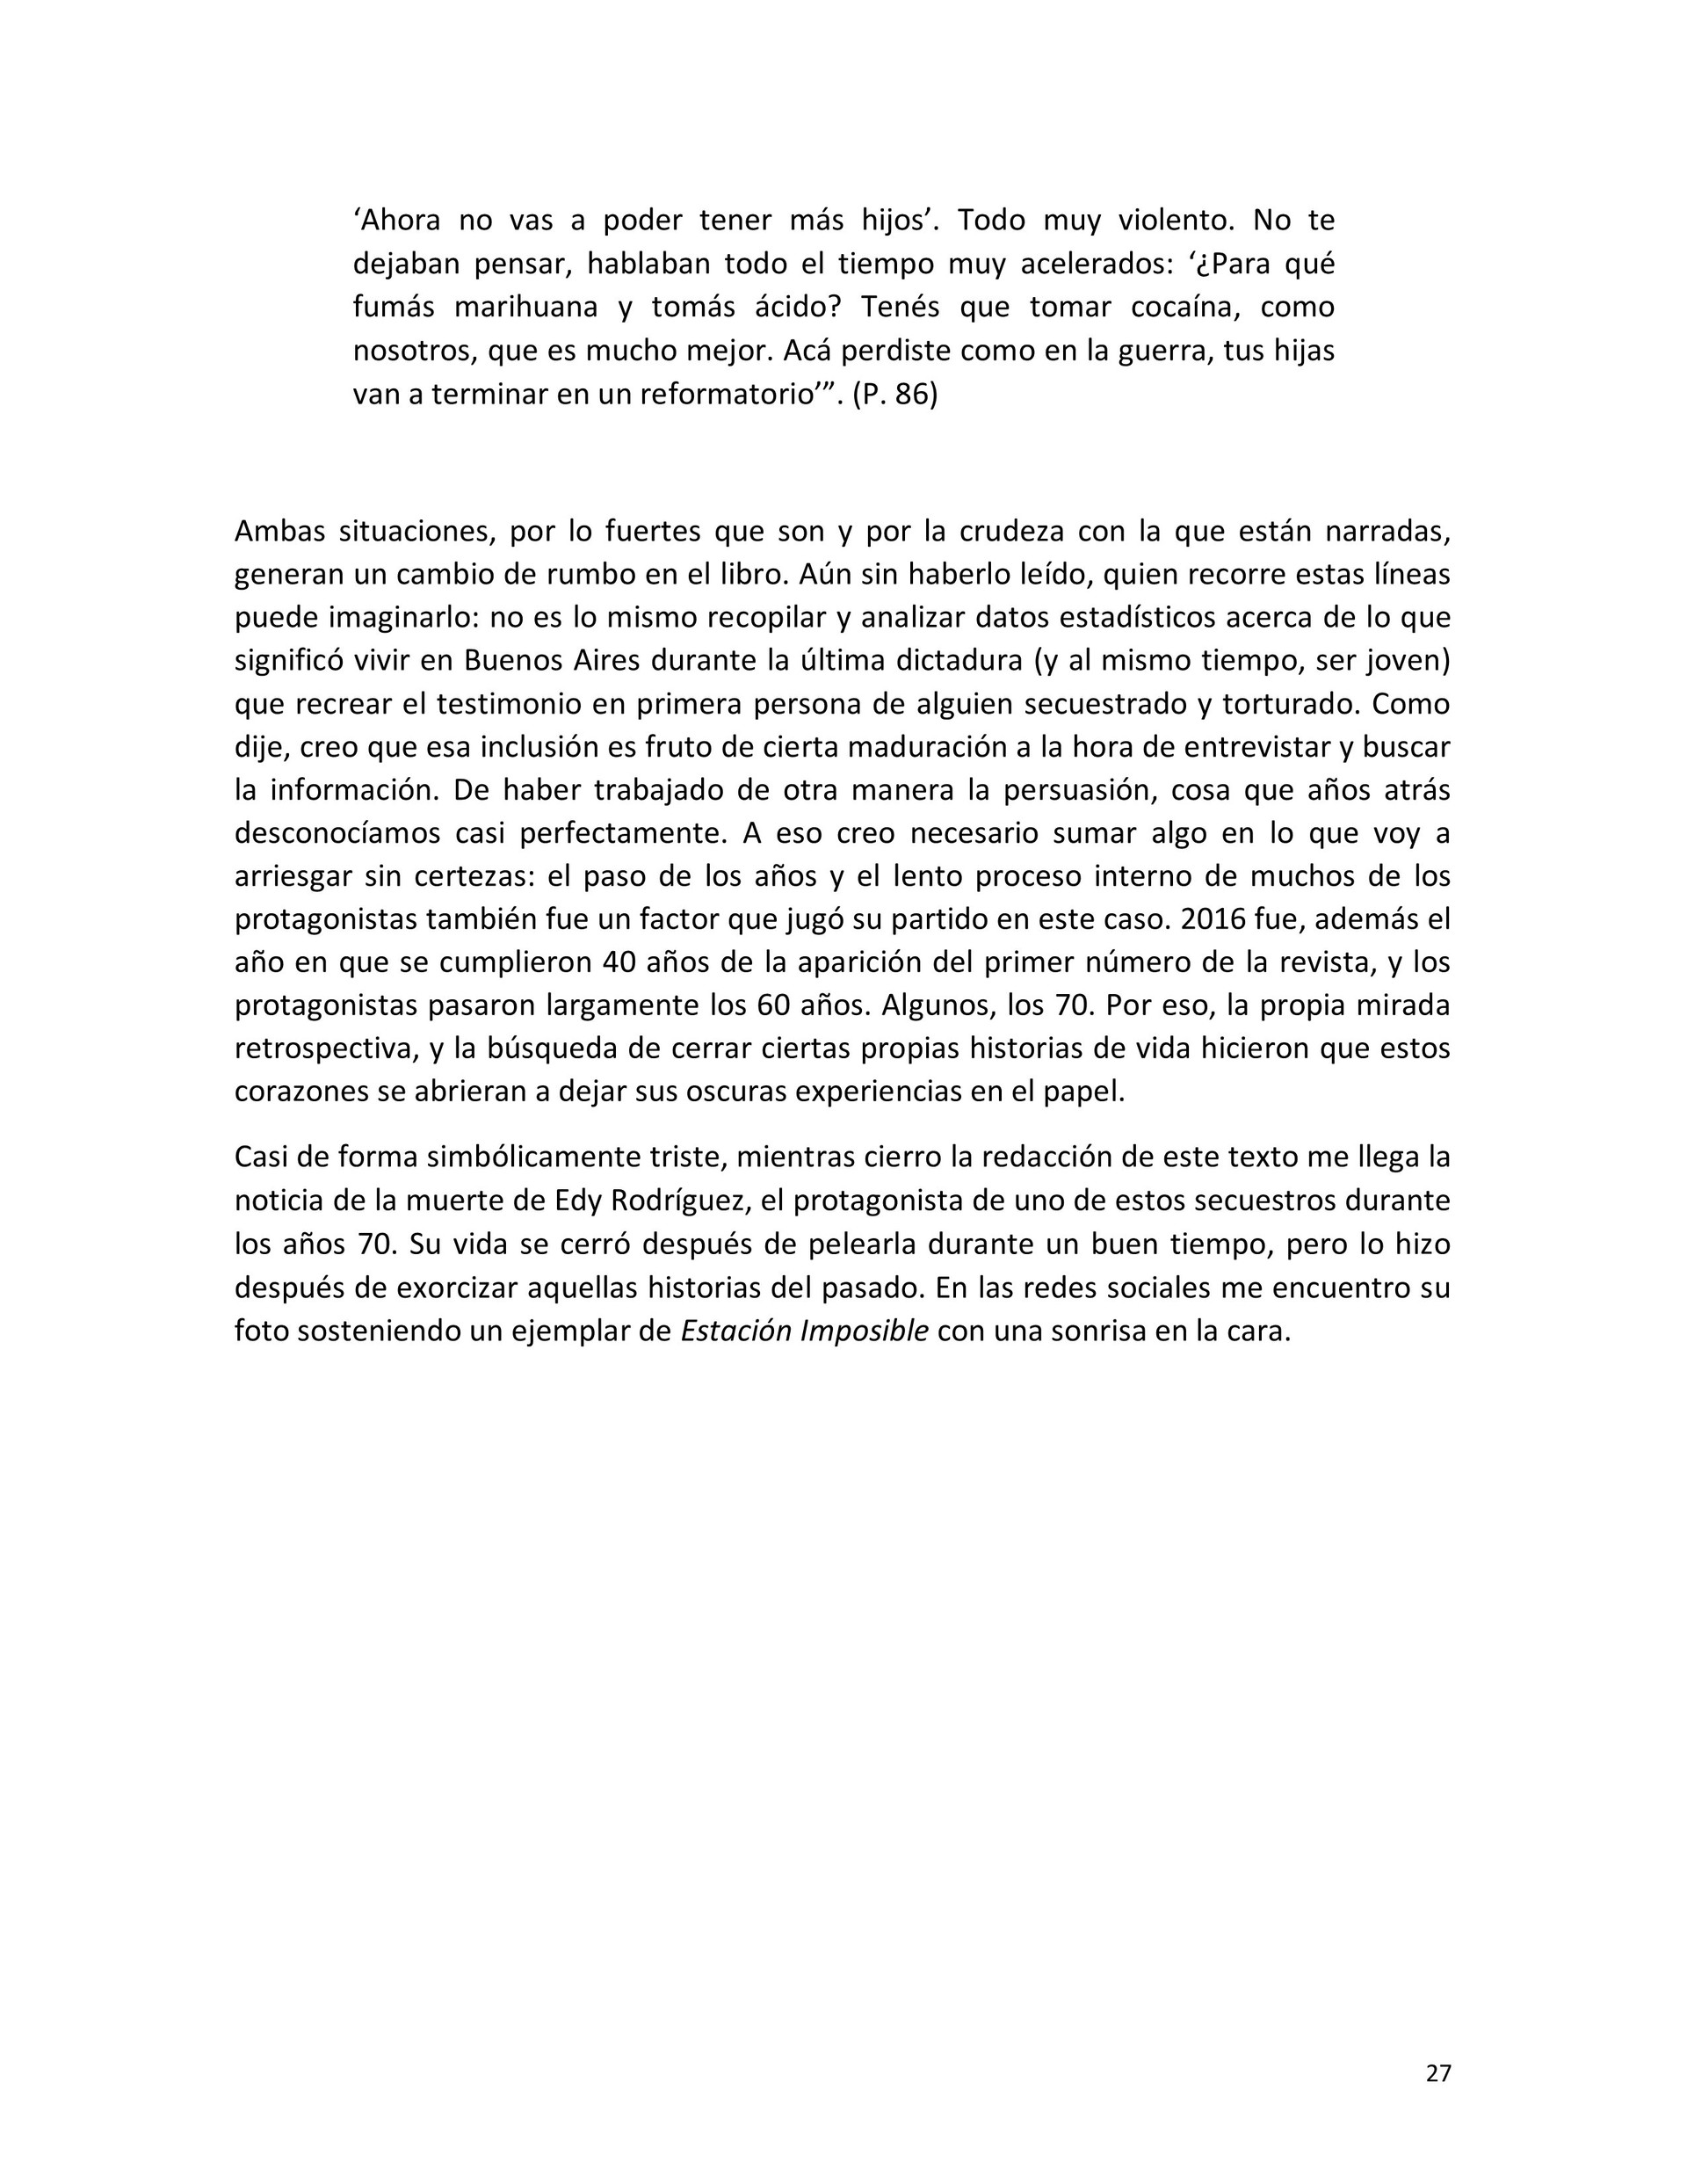 estacion_Page_26.jpeg